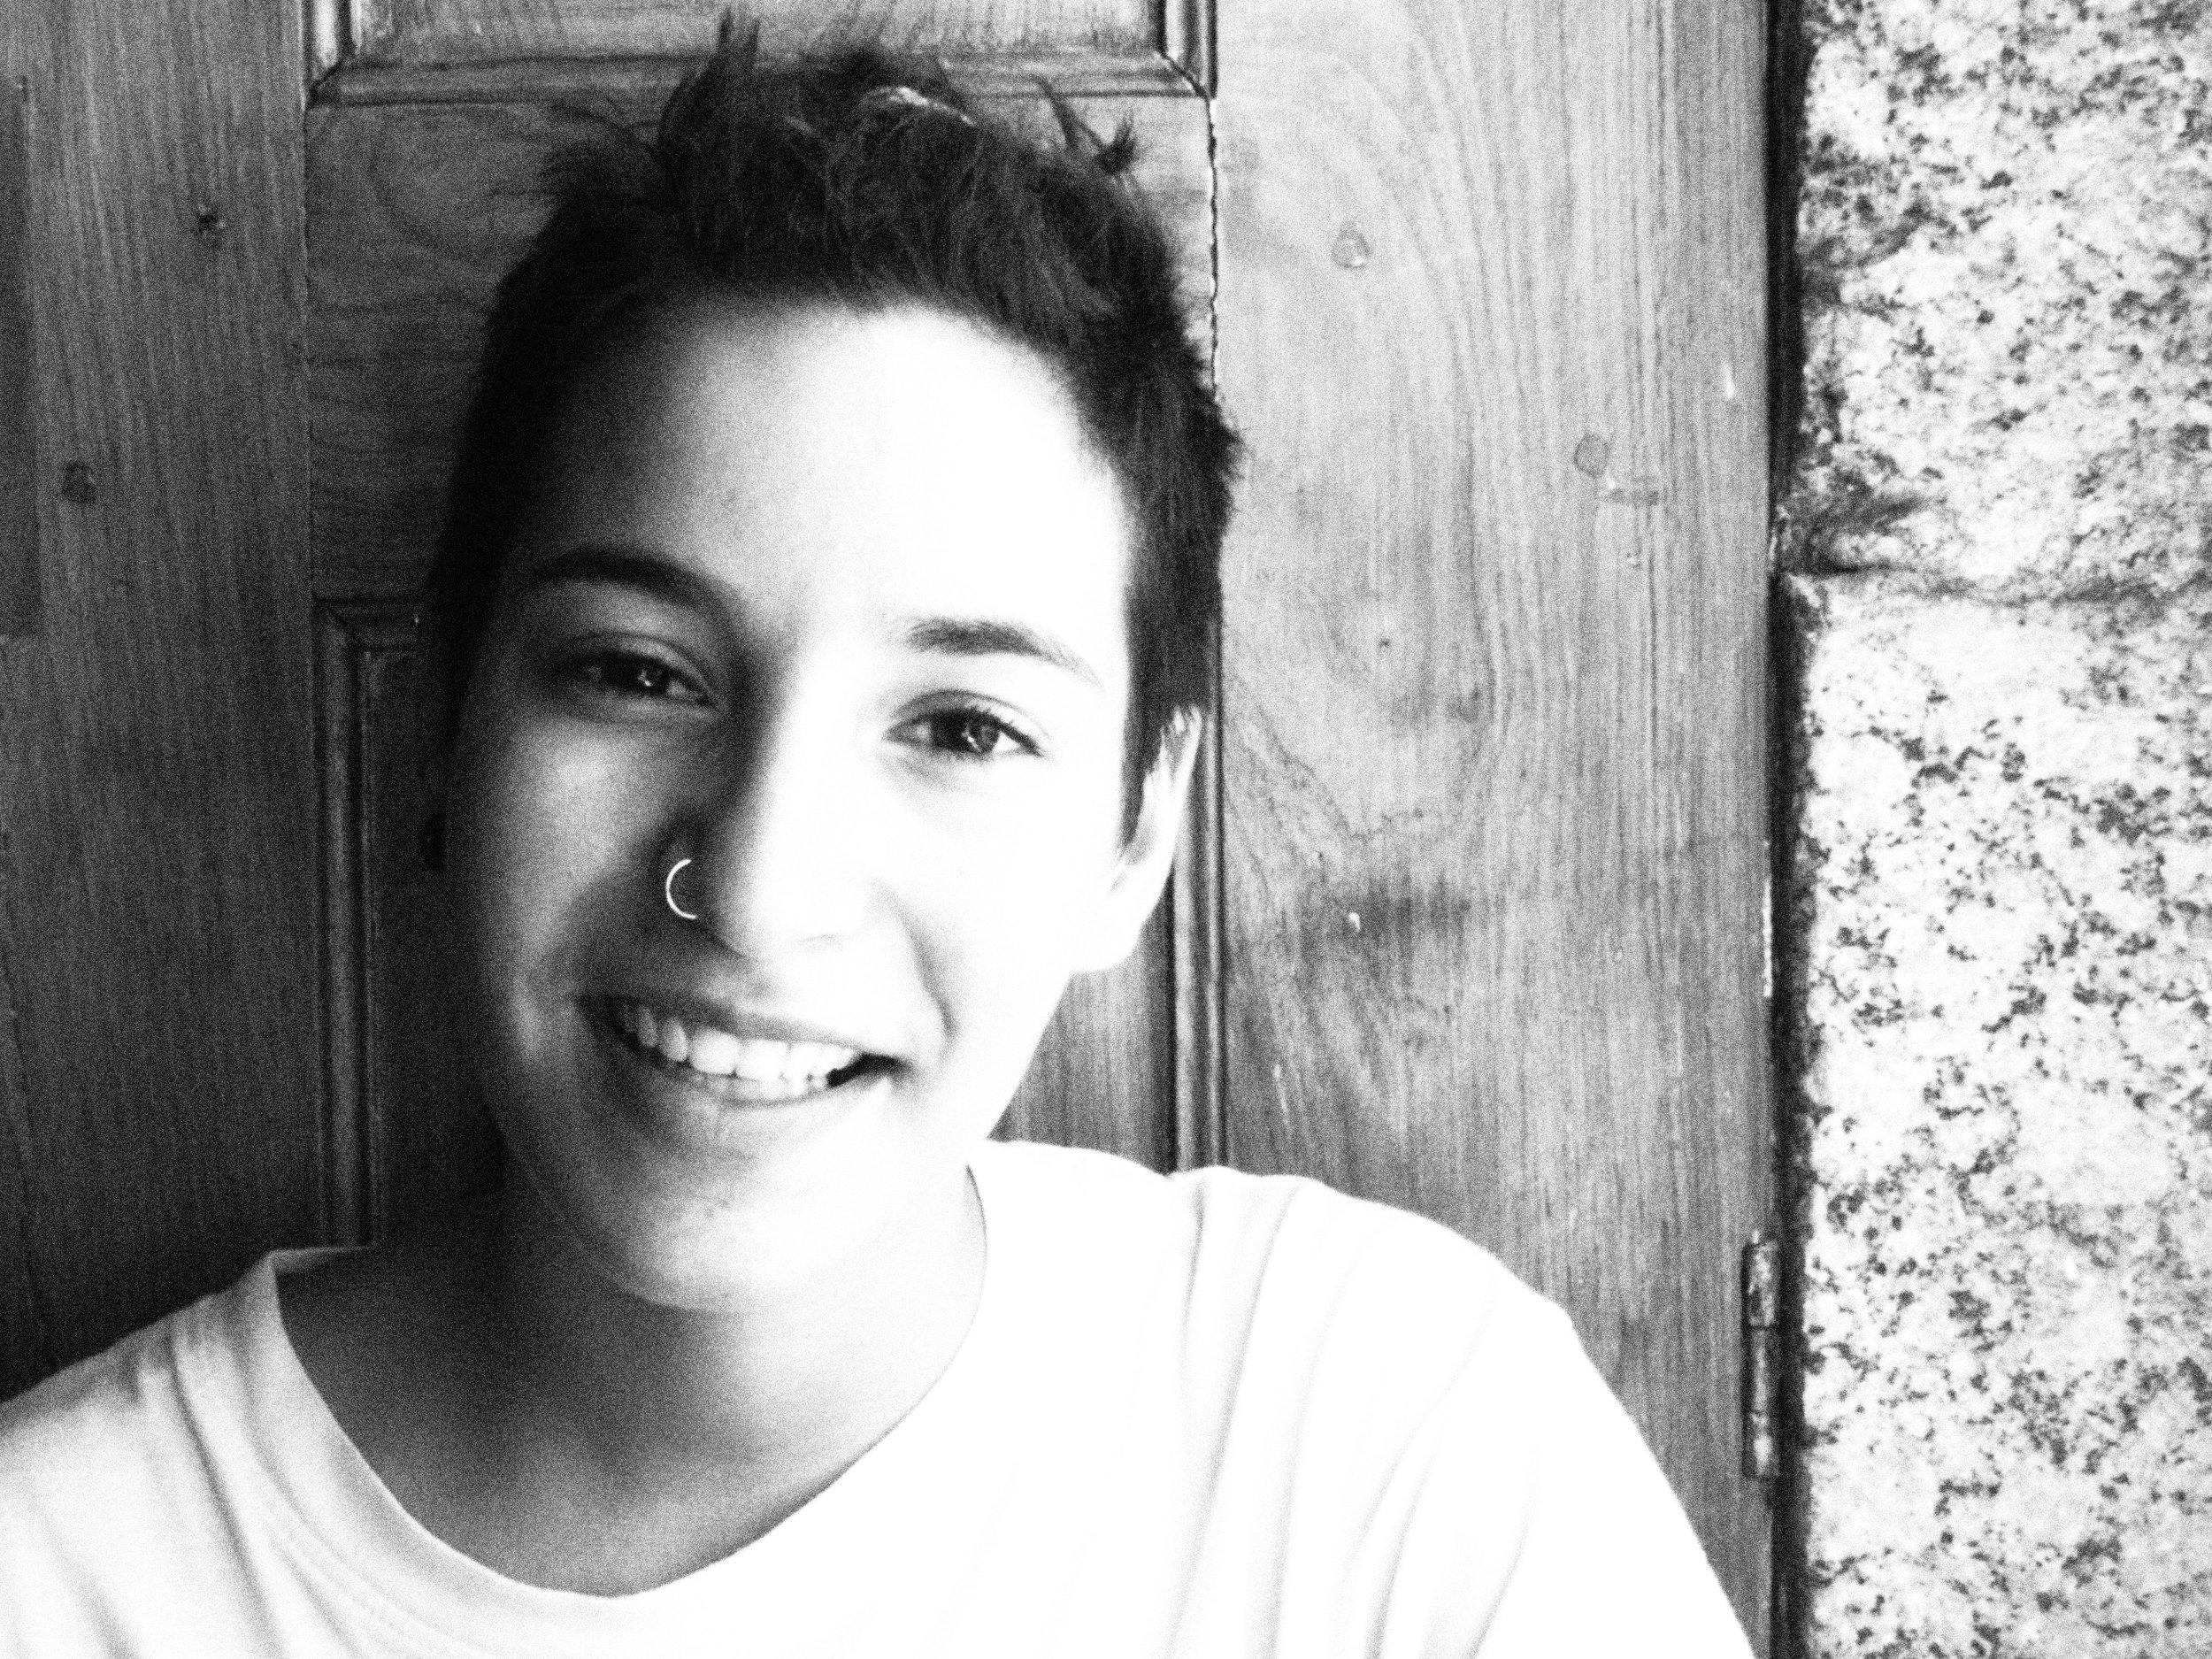 Ângela Castro